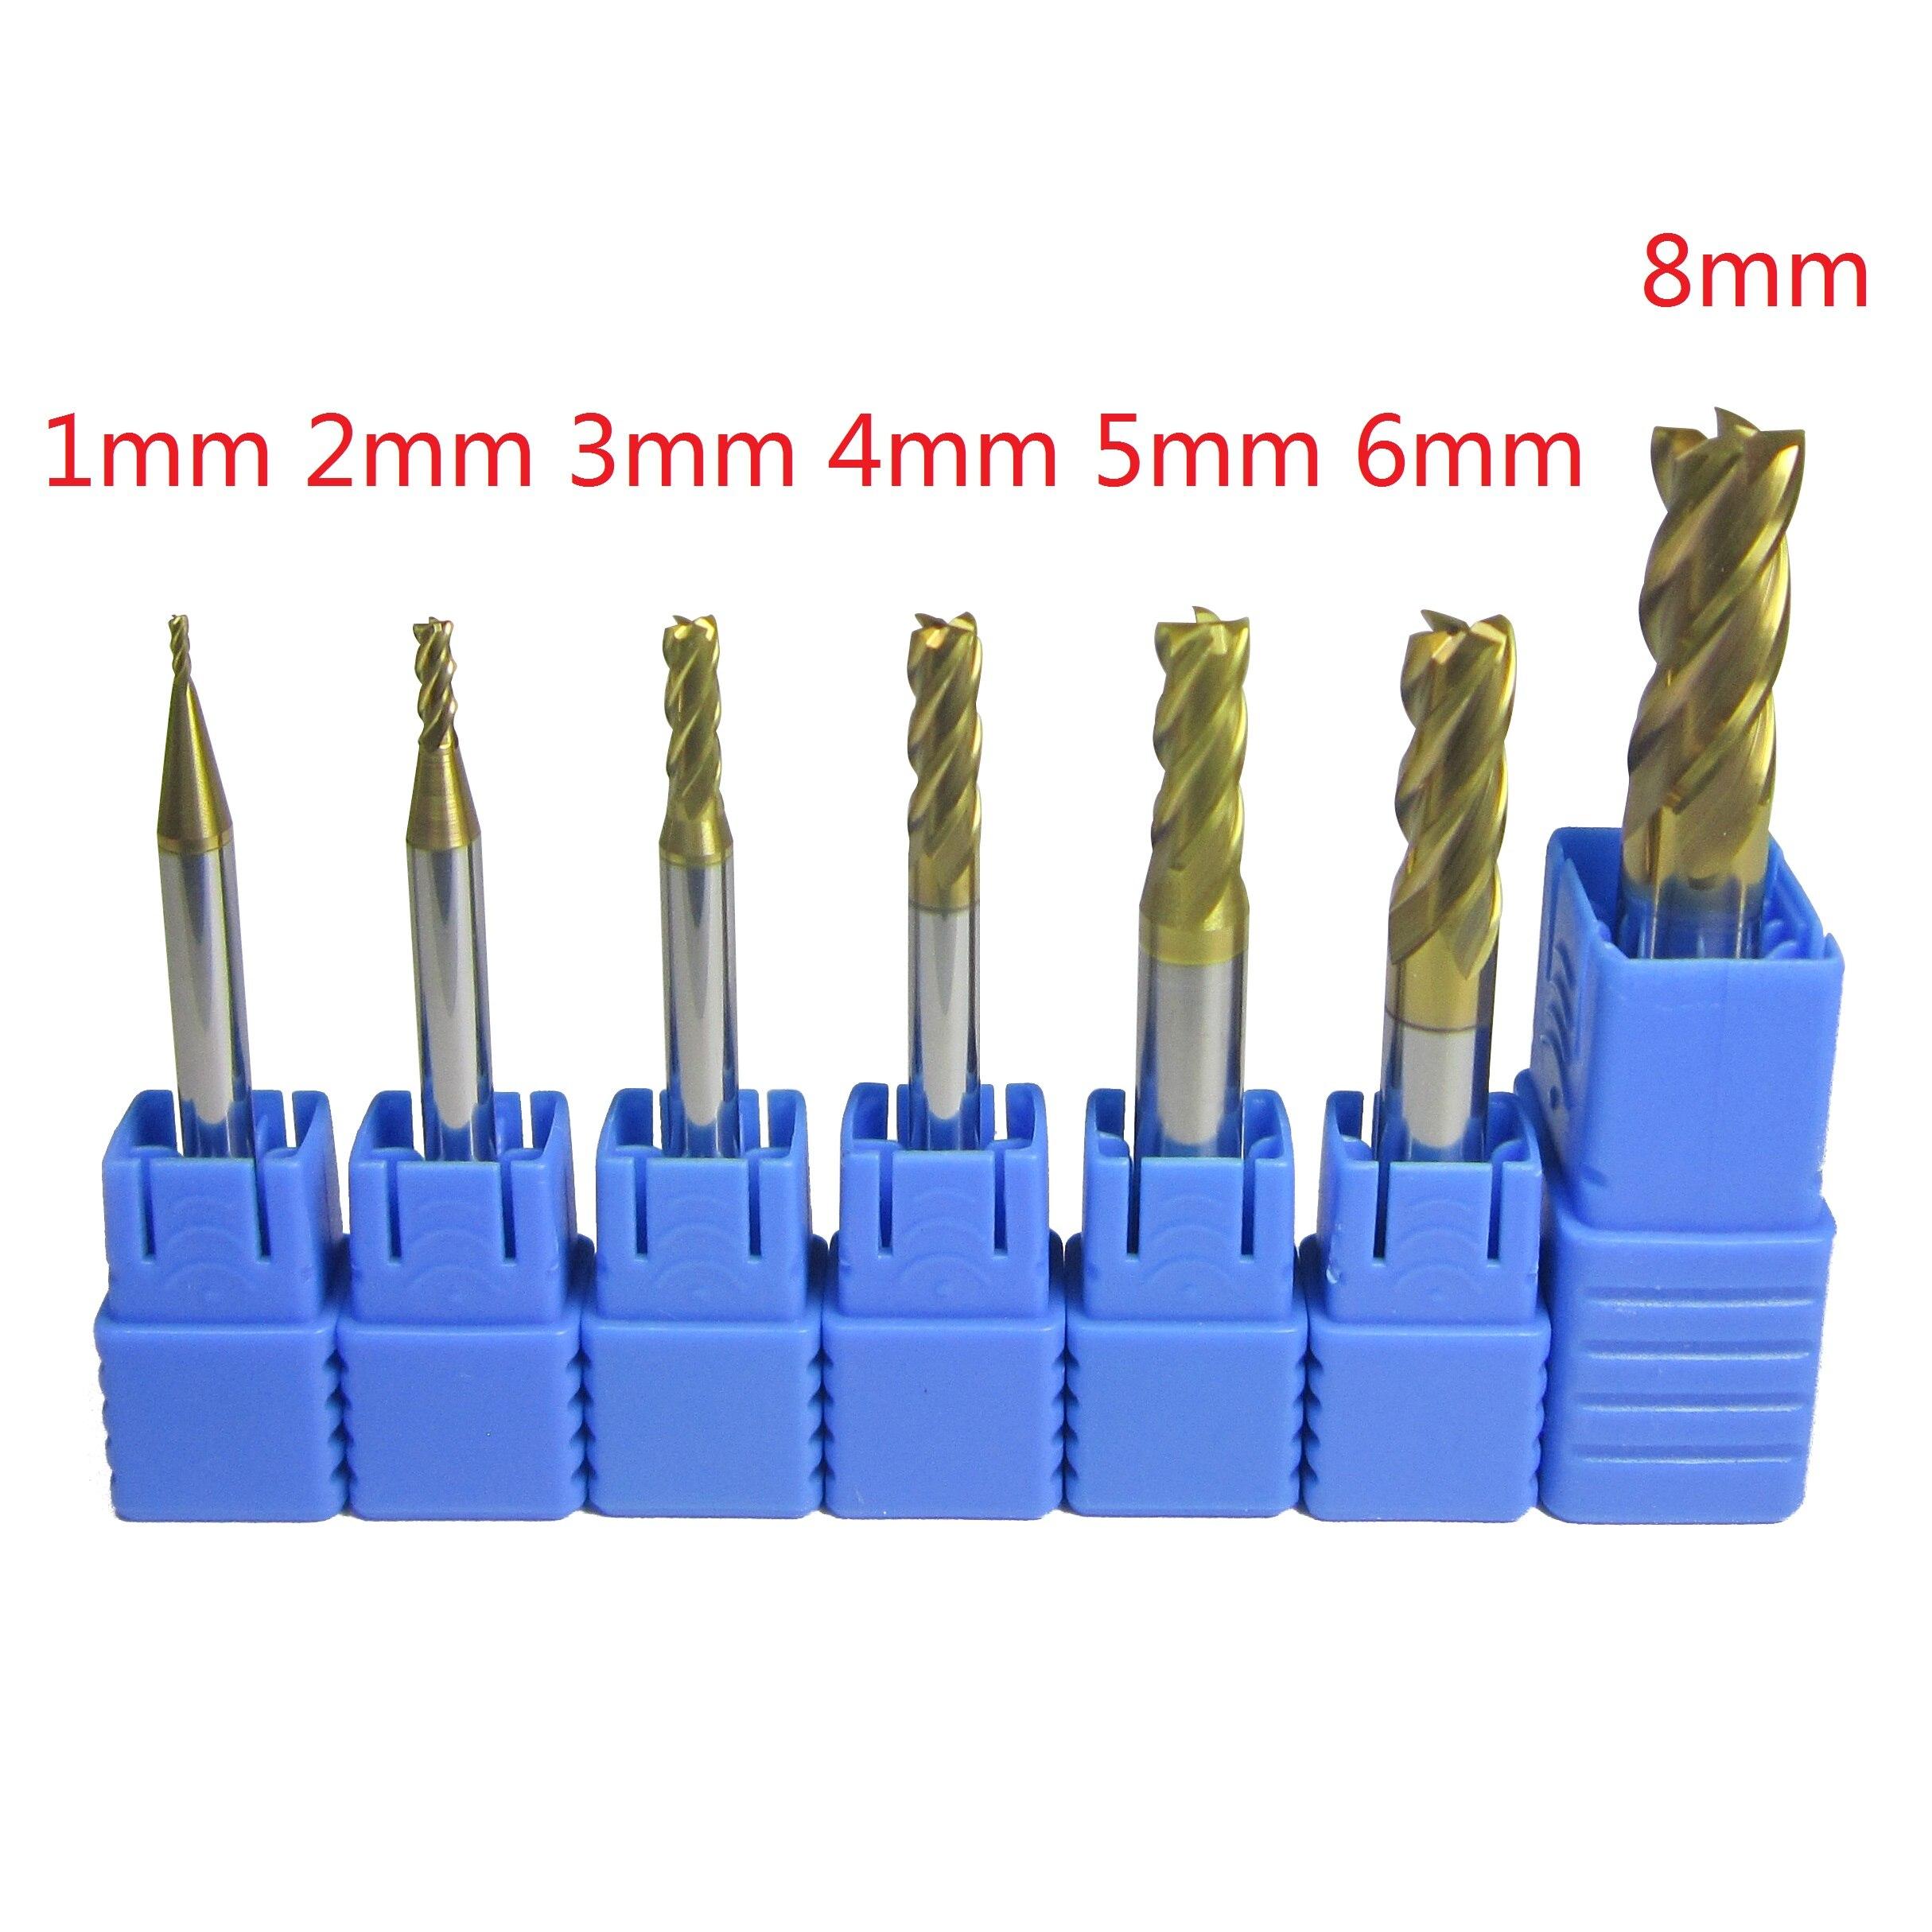 5pcs diameter 6mm HRC58 2 flute Tungsten Carbide End Mill milling cutter CNC